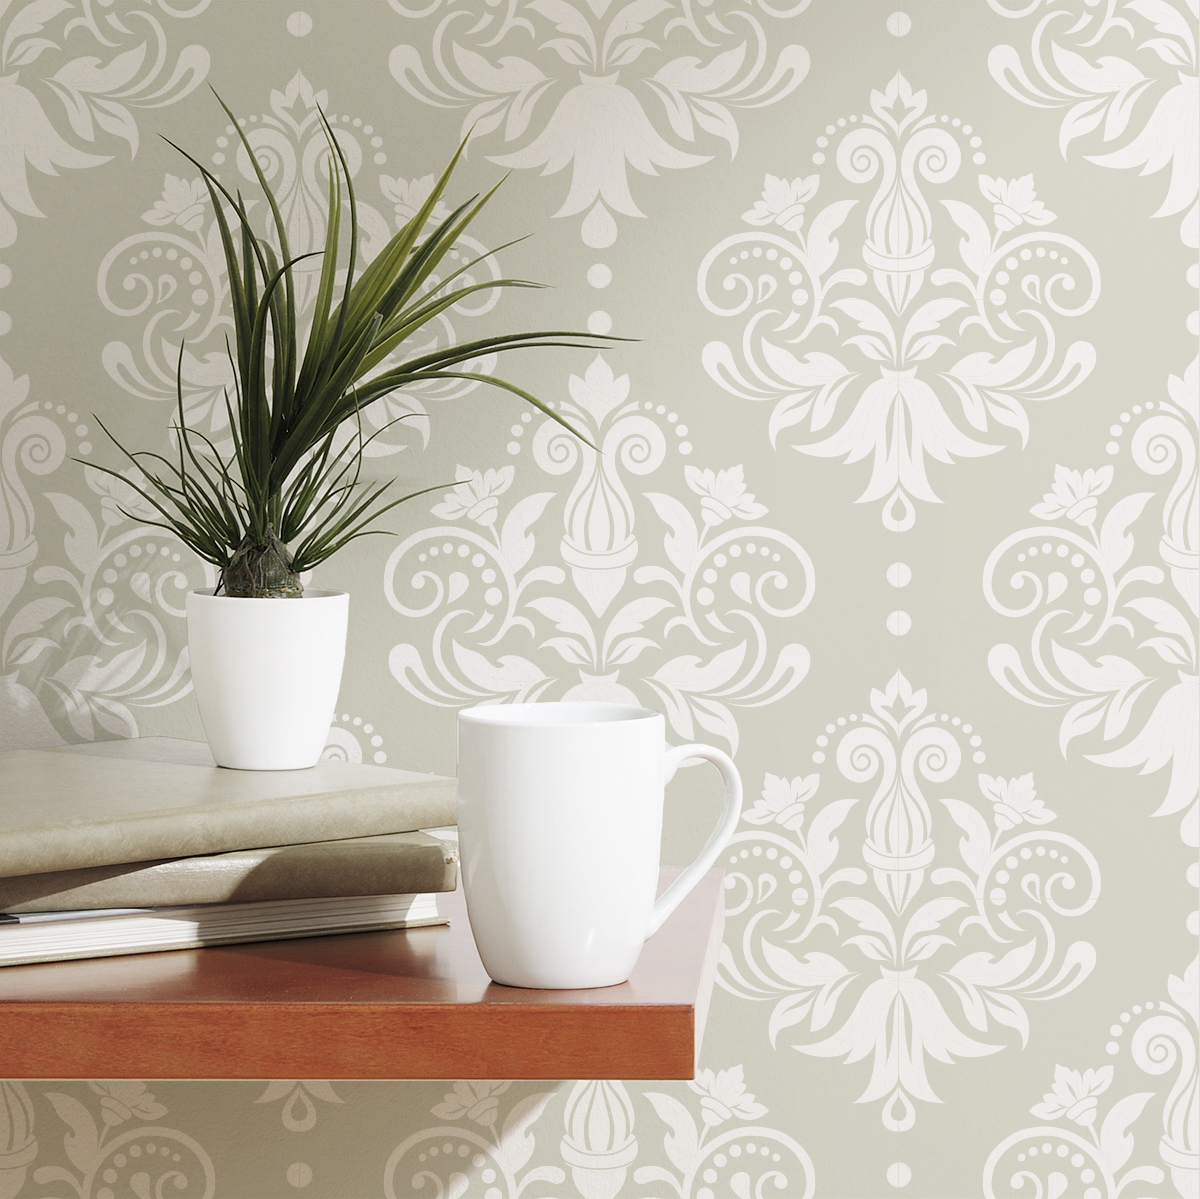 Damask Removable Wallpaper Tile 1200x1199